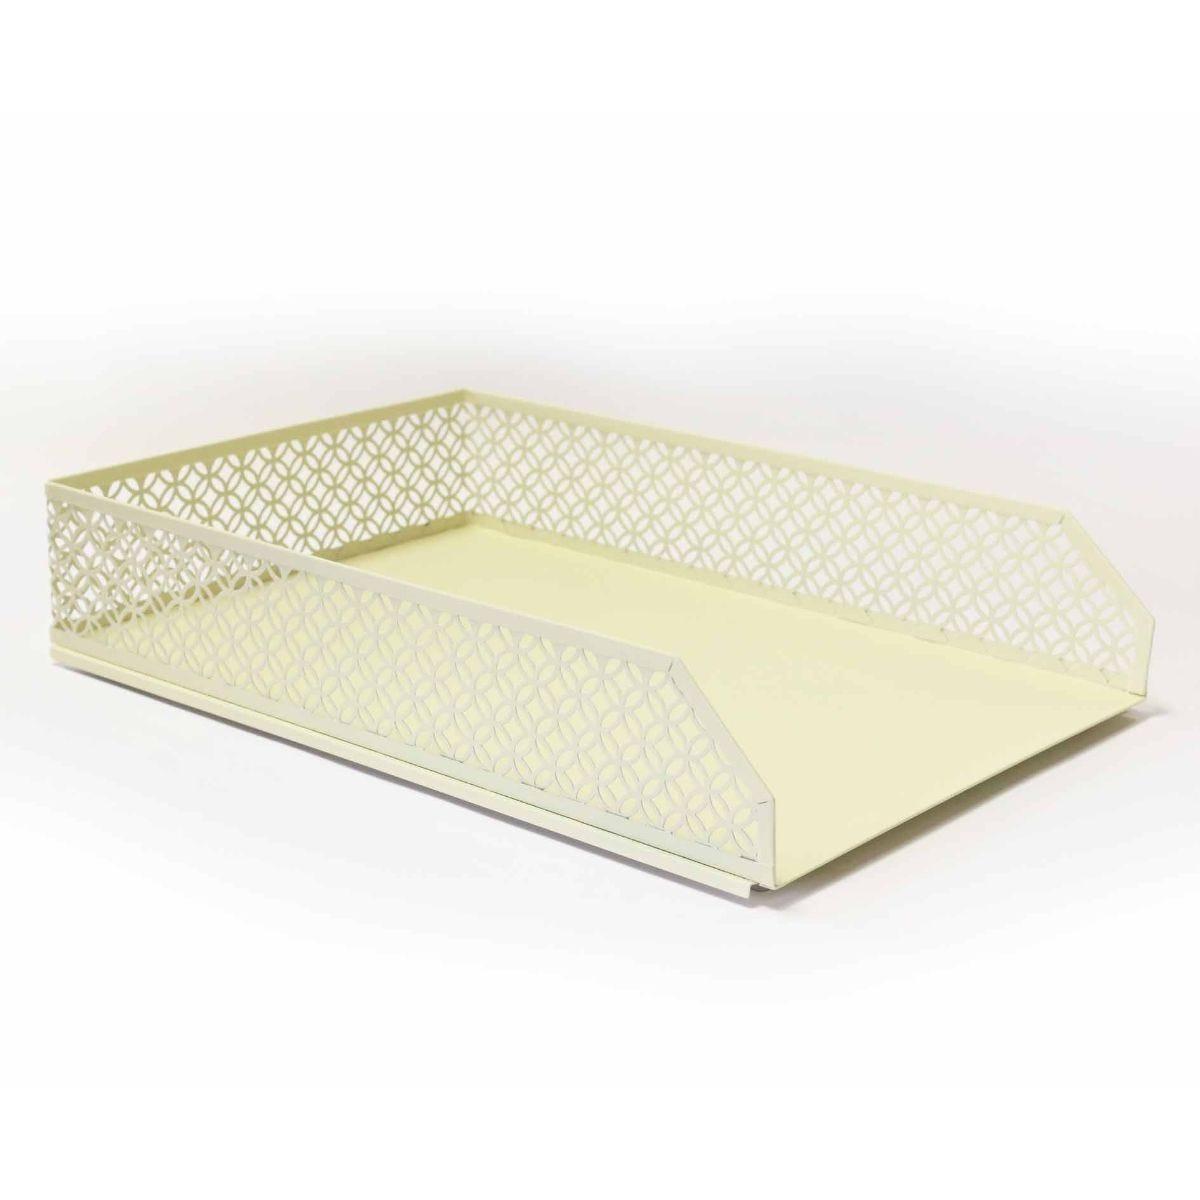 Ryman Geometric Metal Letter Tray A4 Pastel Yellow